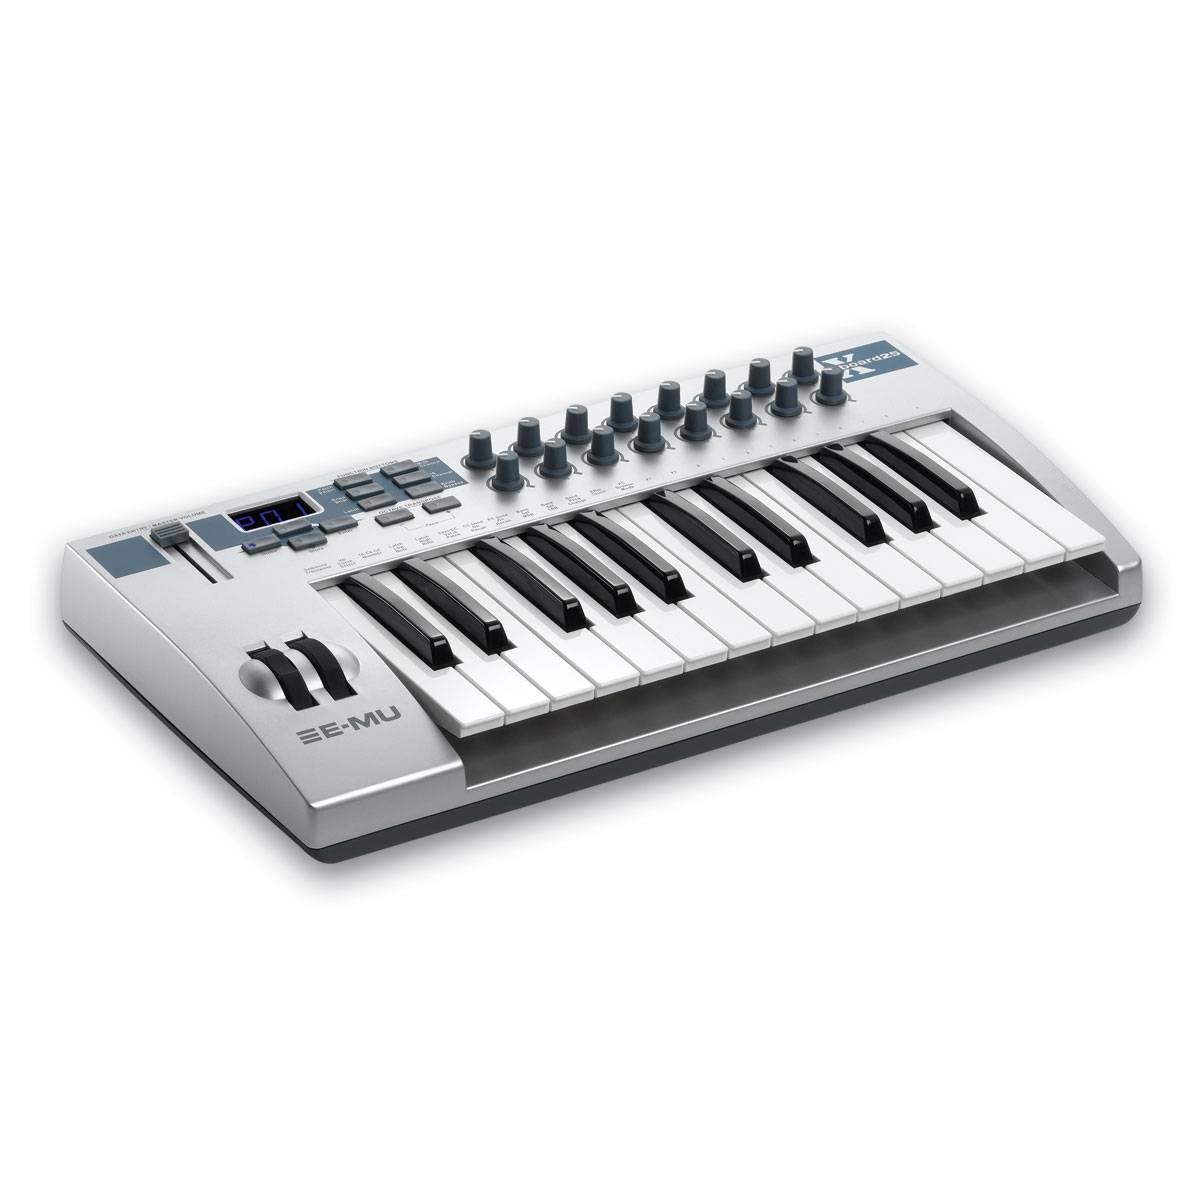 EMU Xboard 25 Midi Keyboard - 25 Key Midi Keyboard from ...